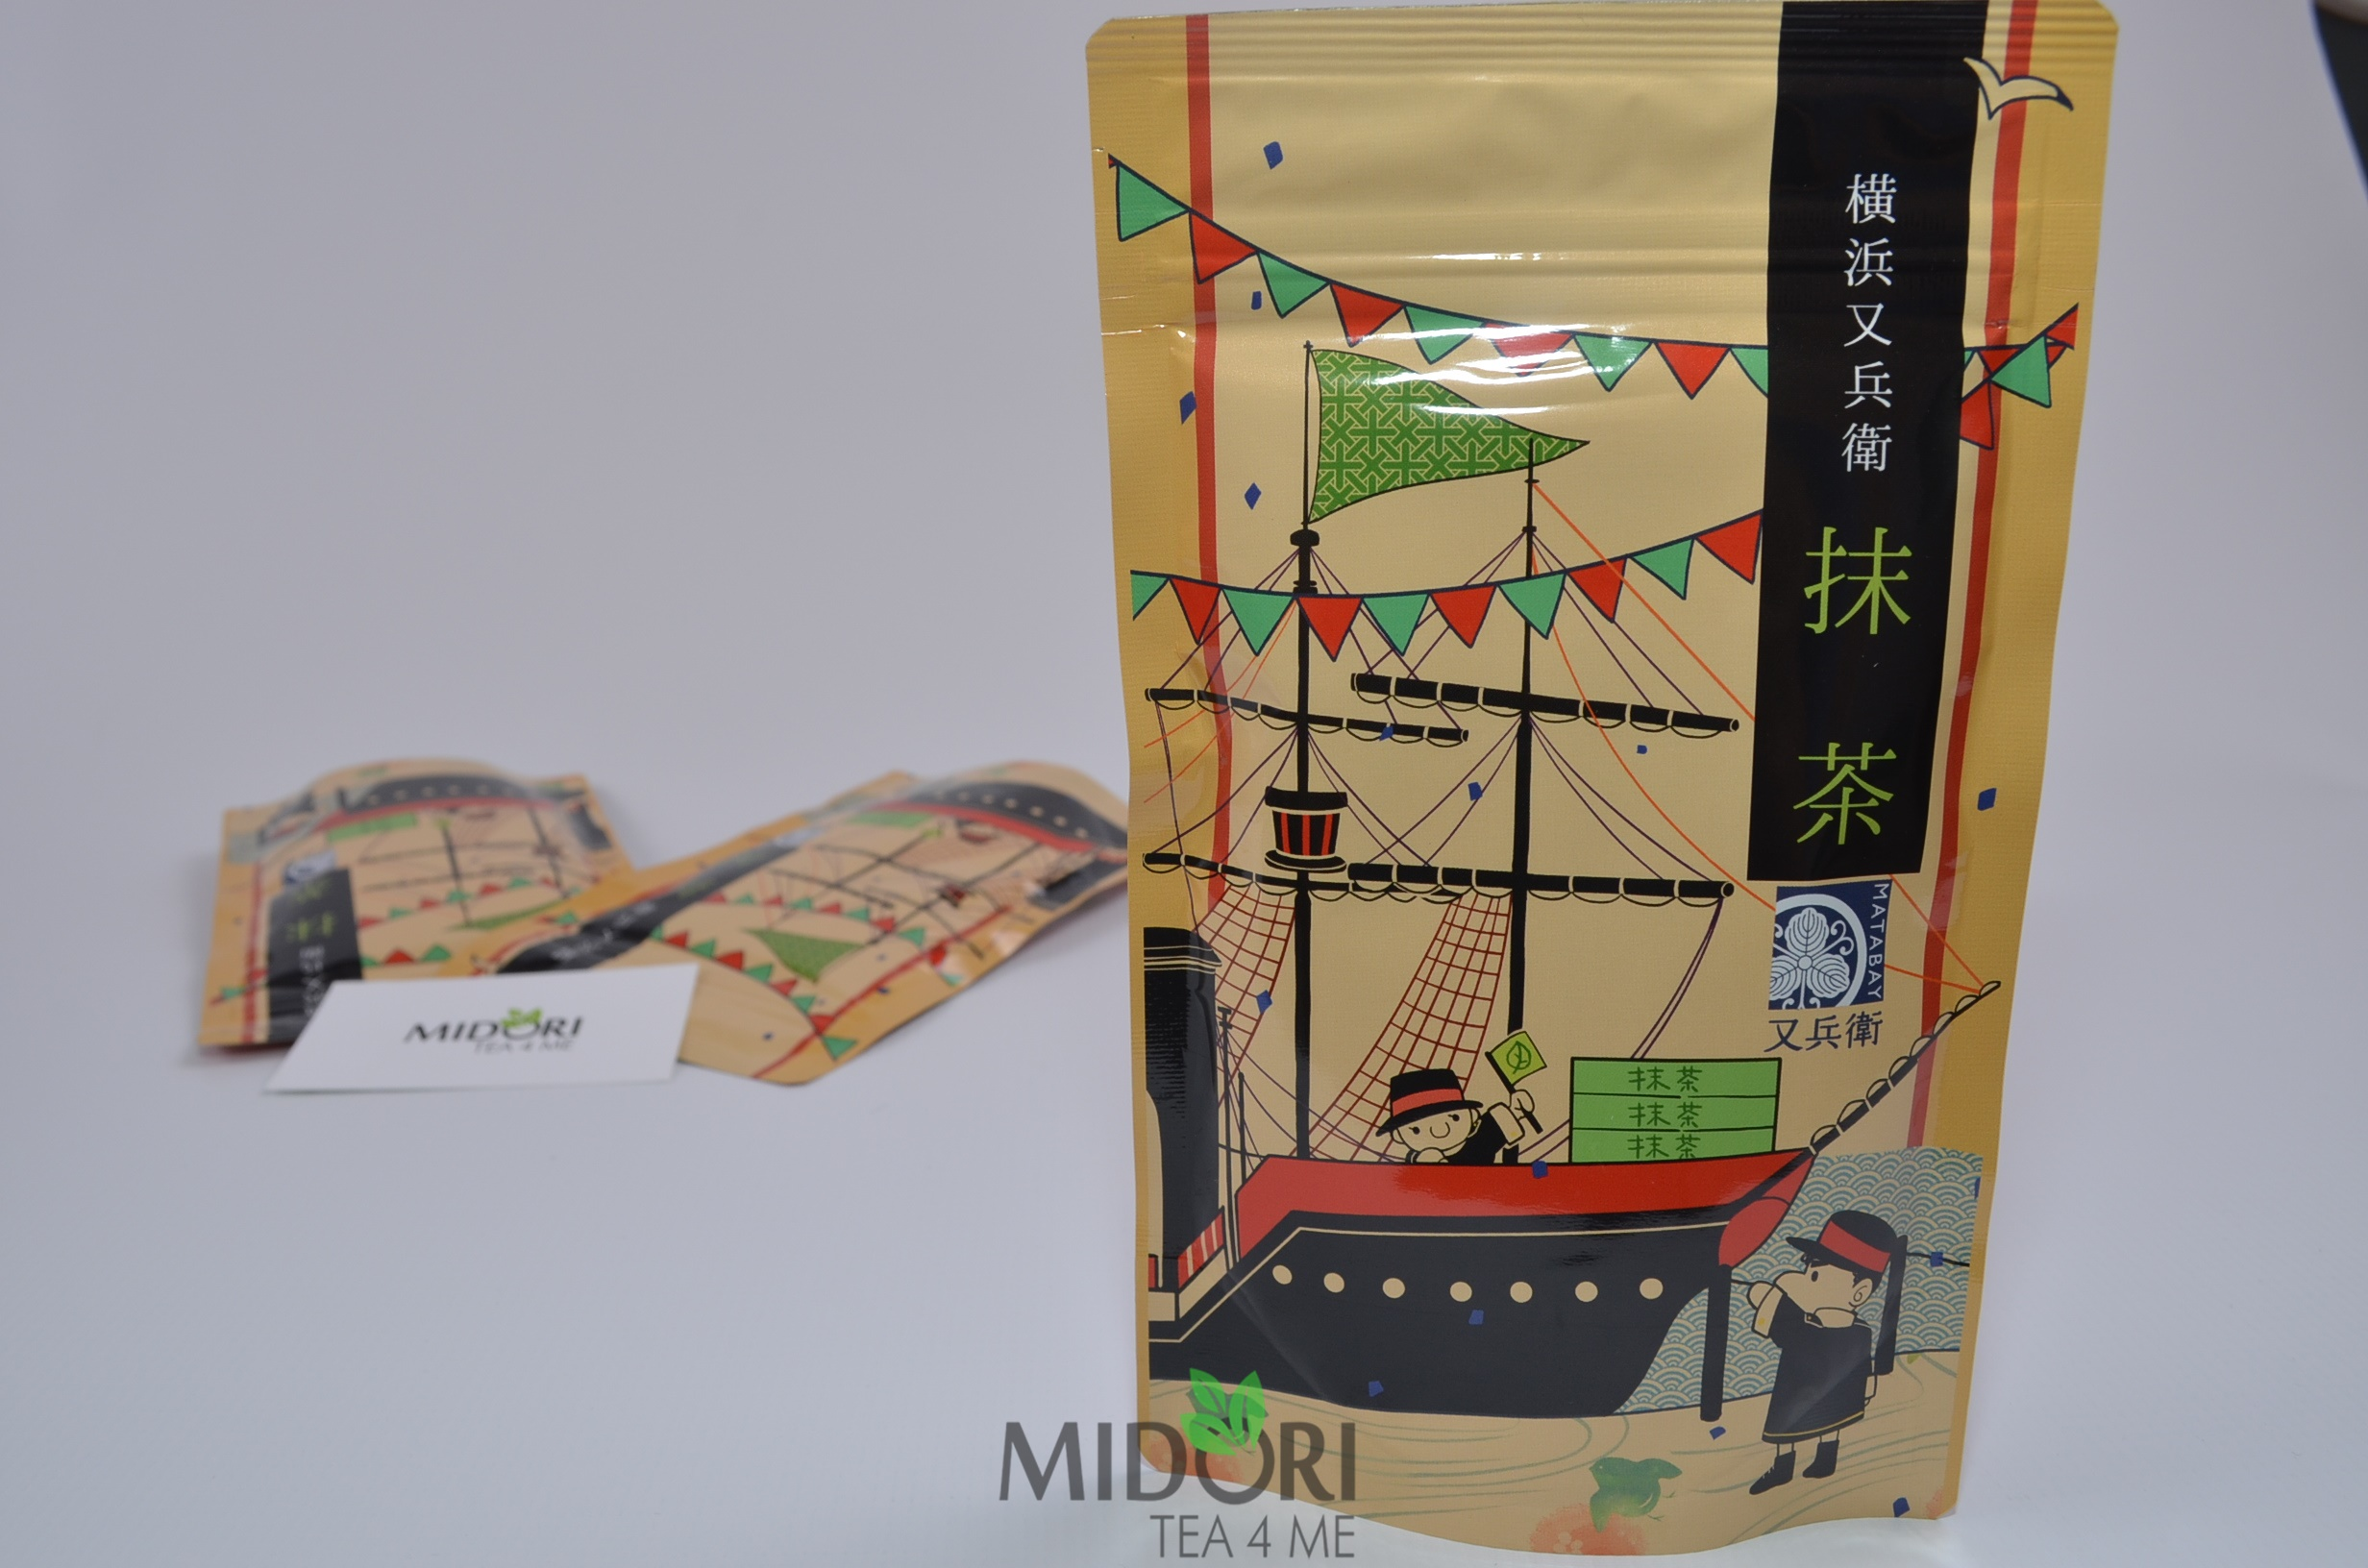 zielona herbata matcha, japońska matcha, matcha